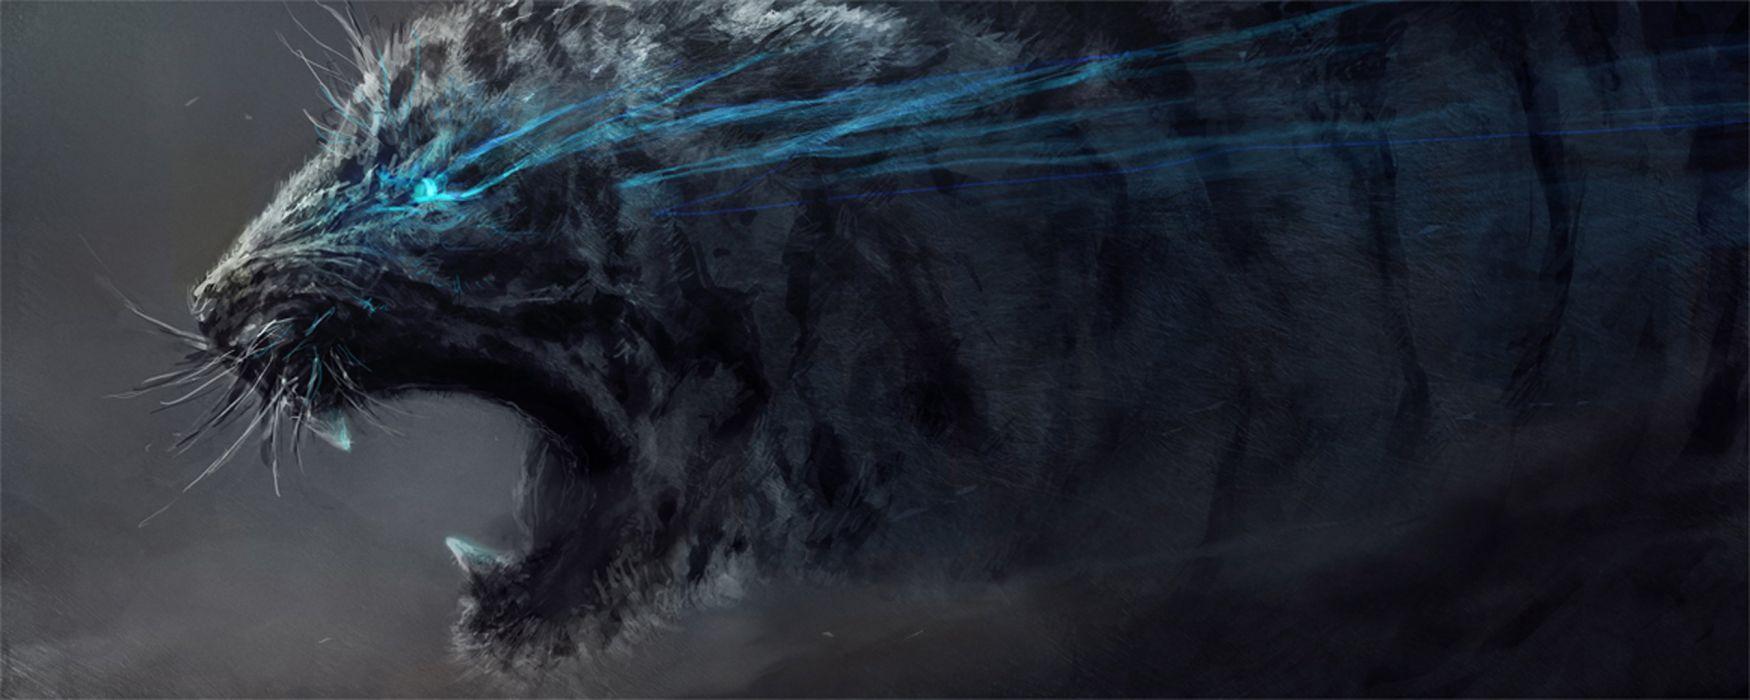 tigers artwork wallpaper